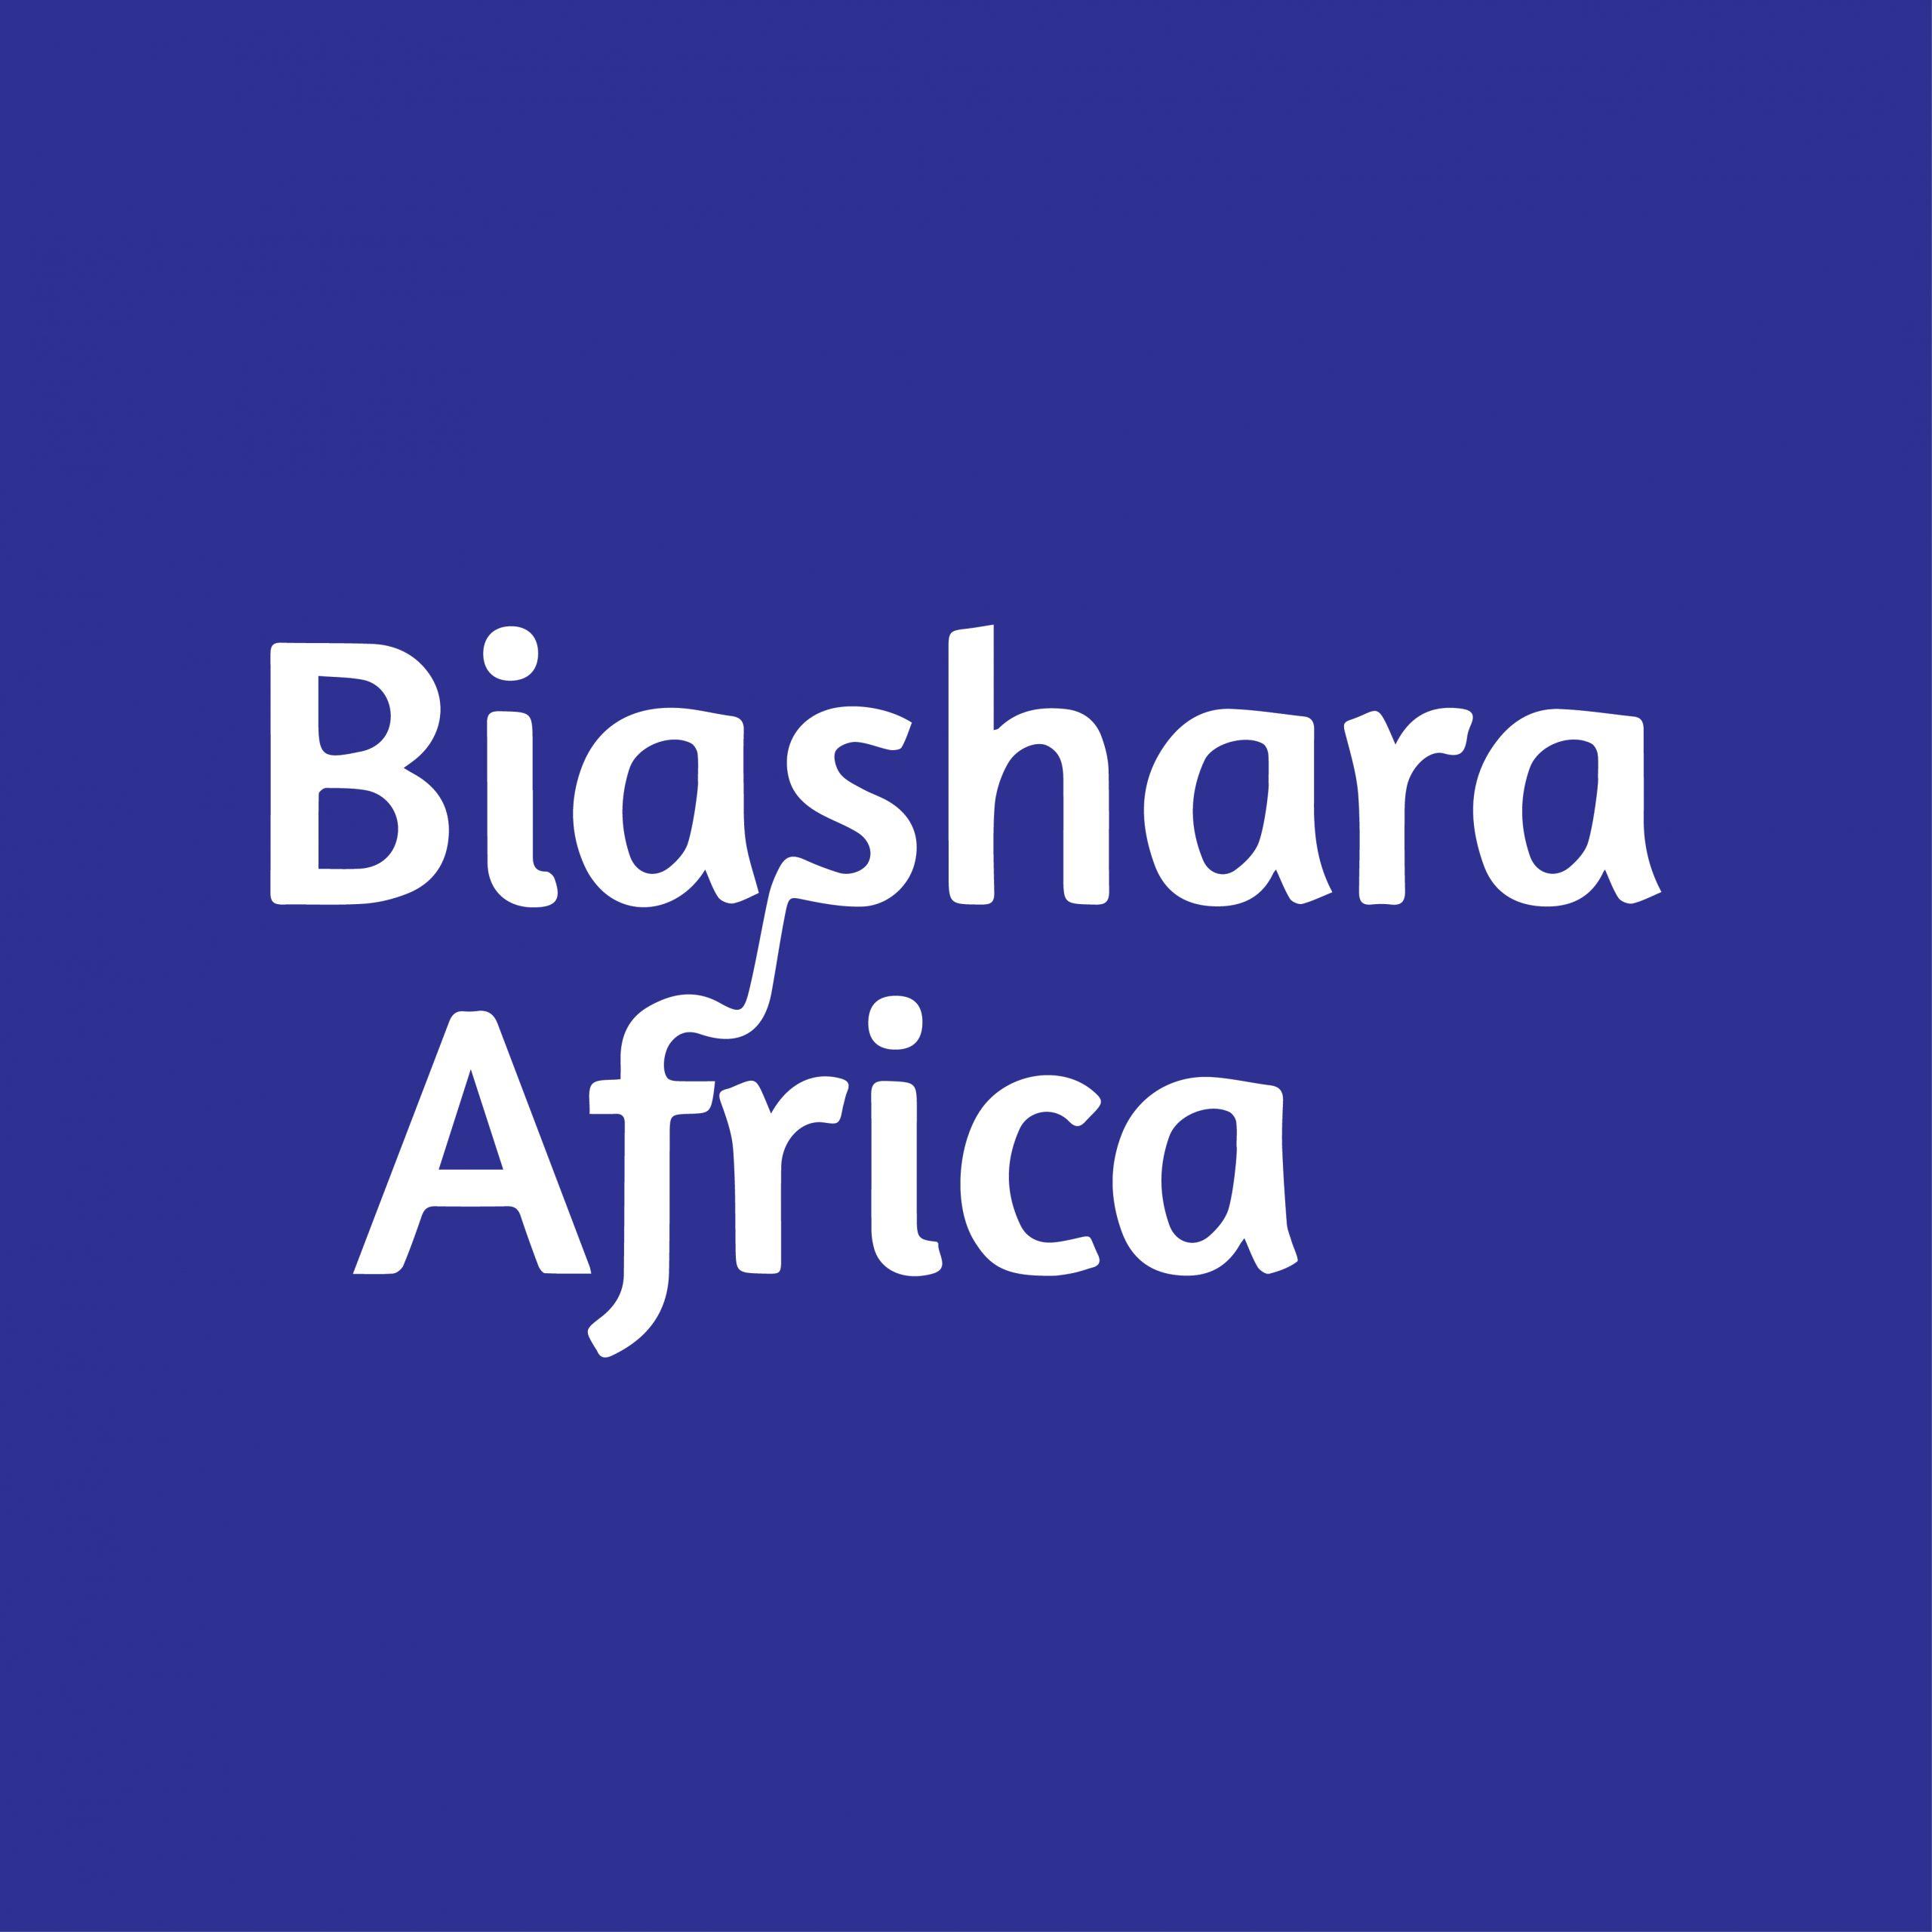 Biashara Africa Ltd.